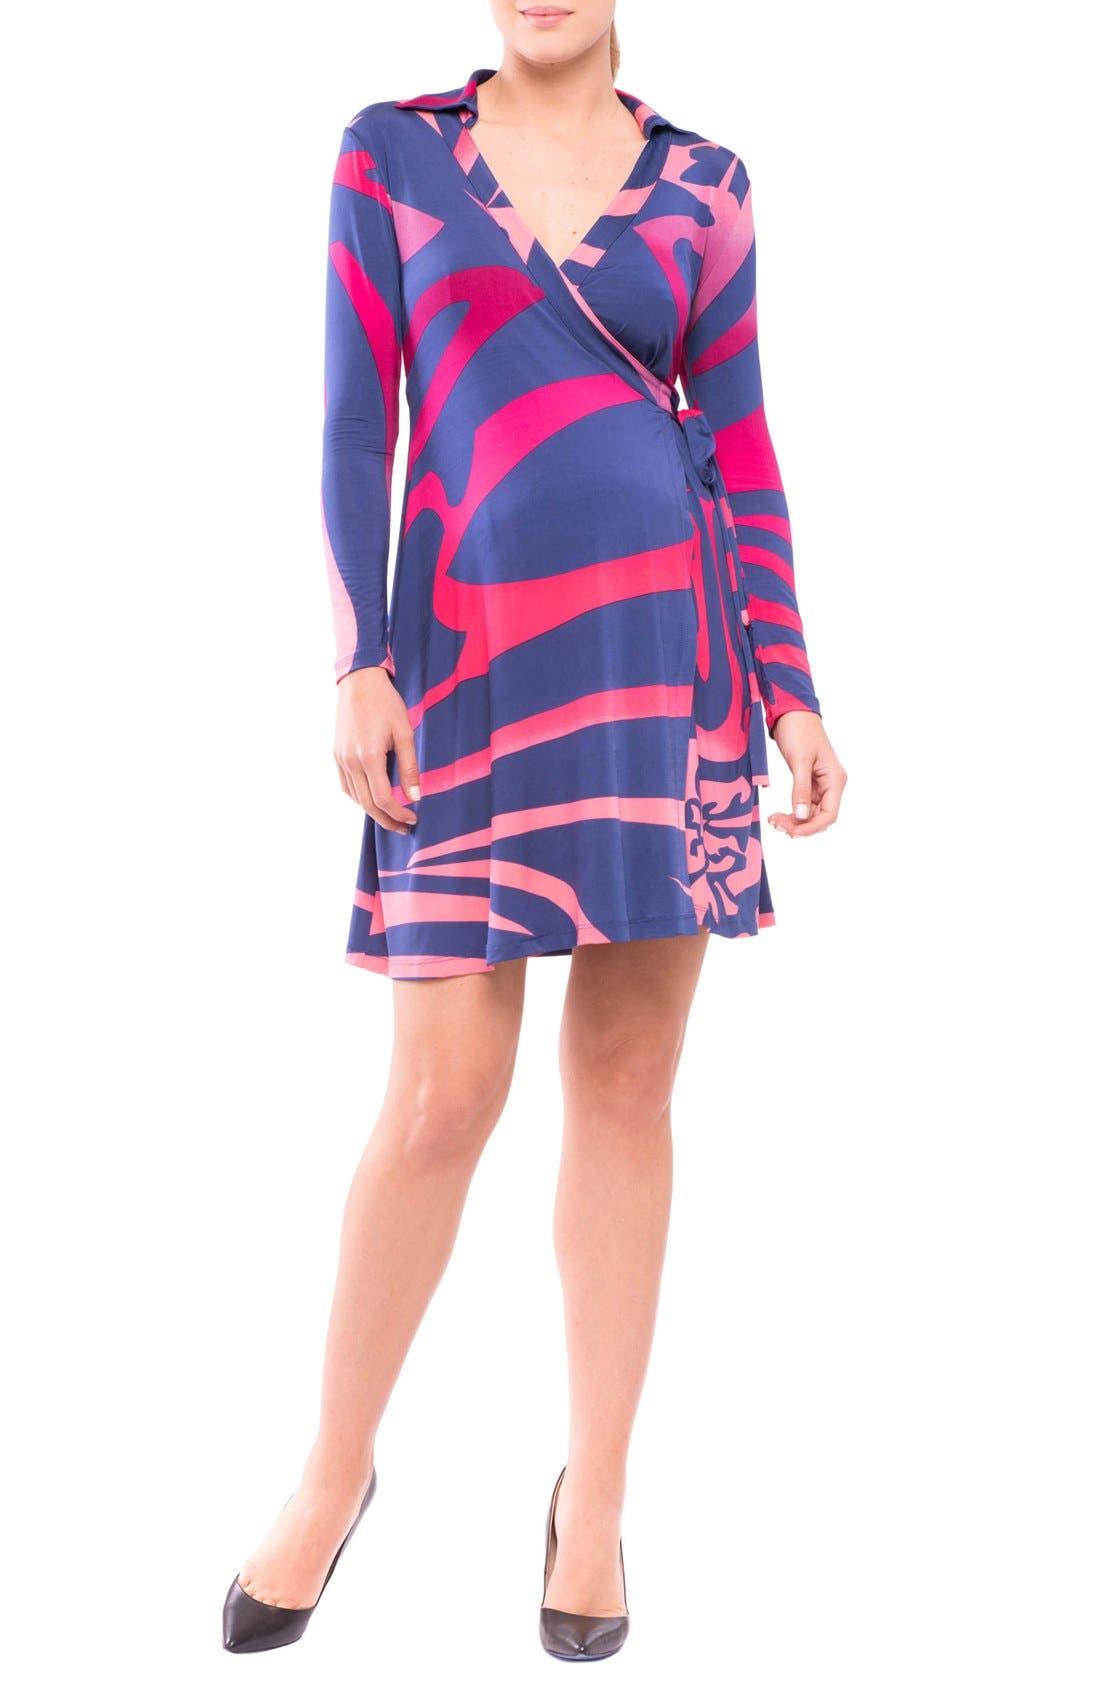 Lorraine Wrap Maternity Dress,                             Main thumbnail 1, color,                             Pink/ Blue Print